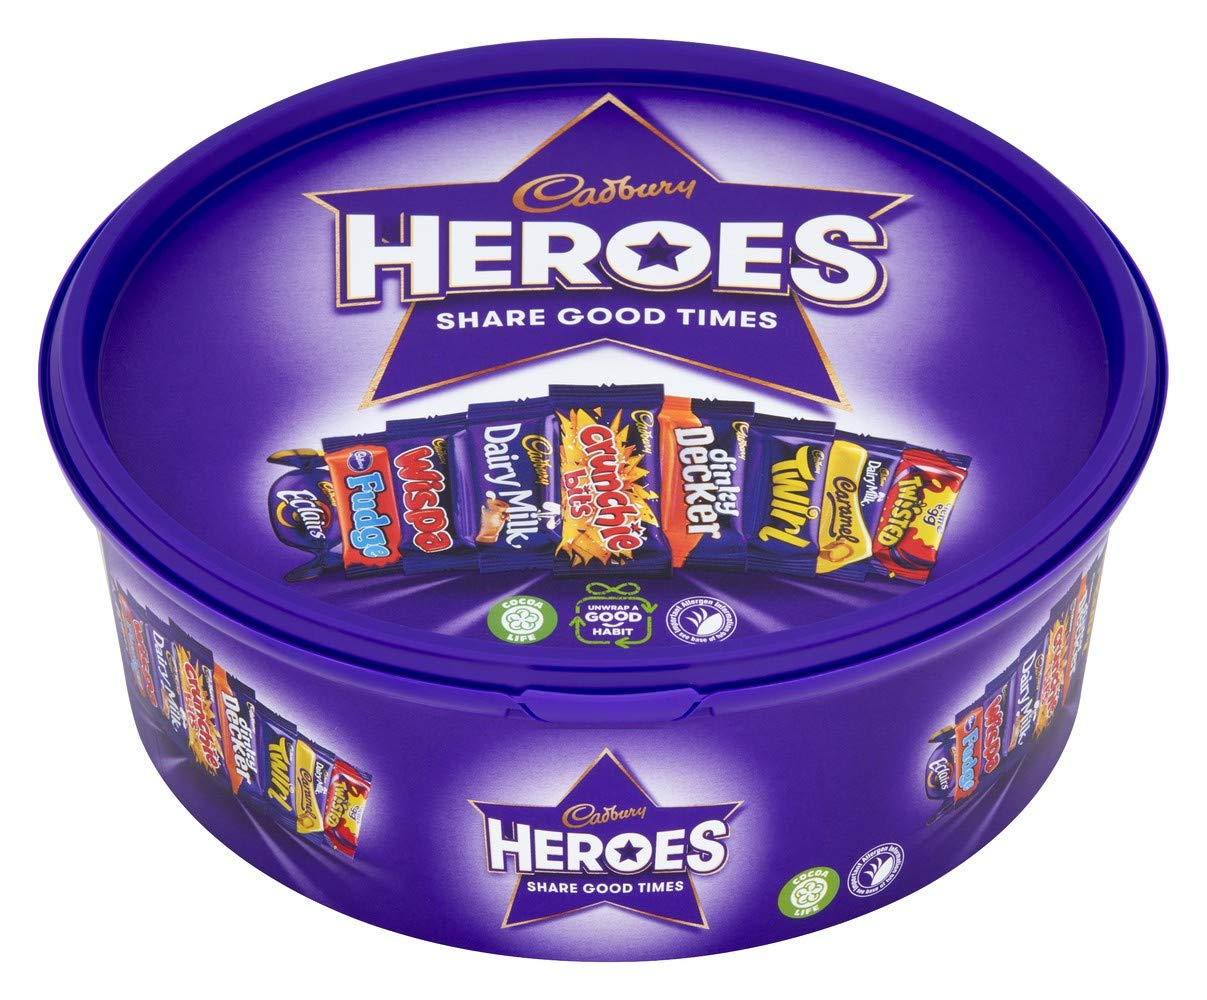 Cadbury Heroes Chocolate Tub, 660 g